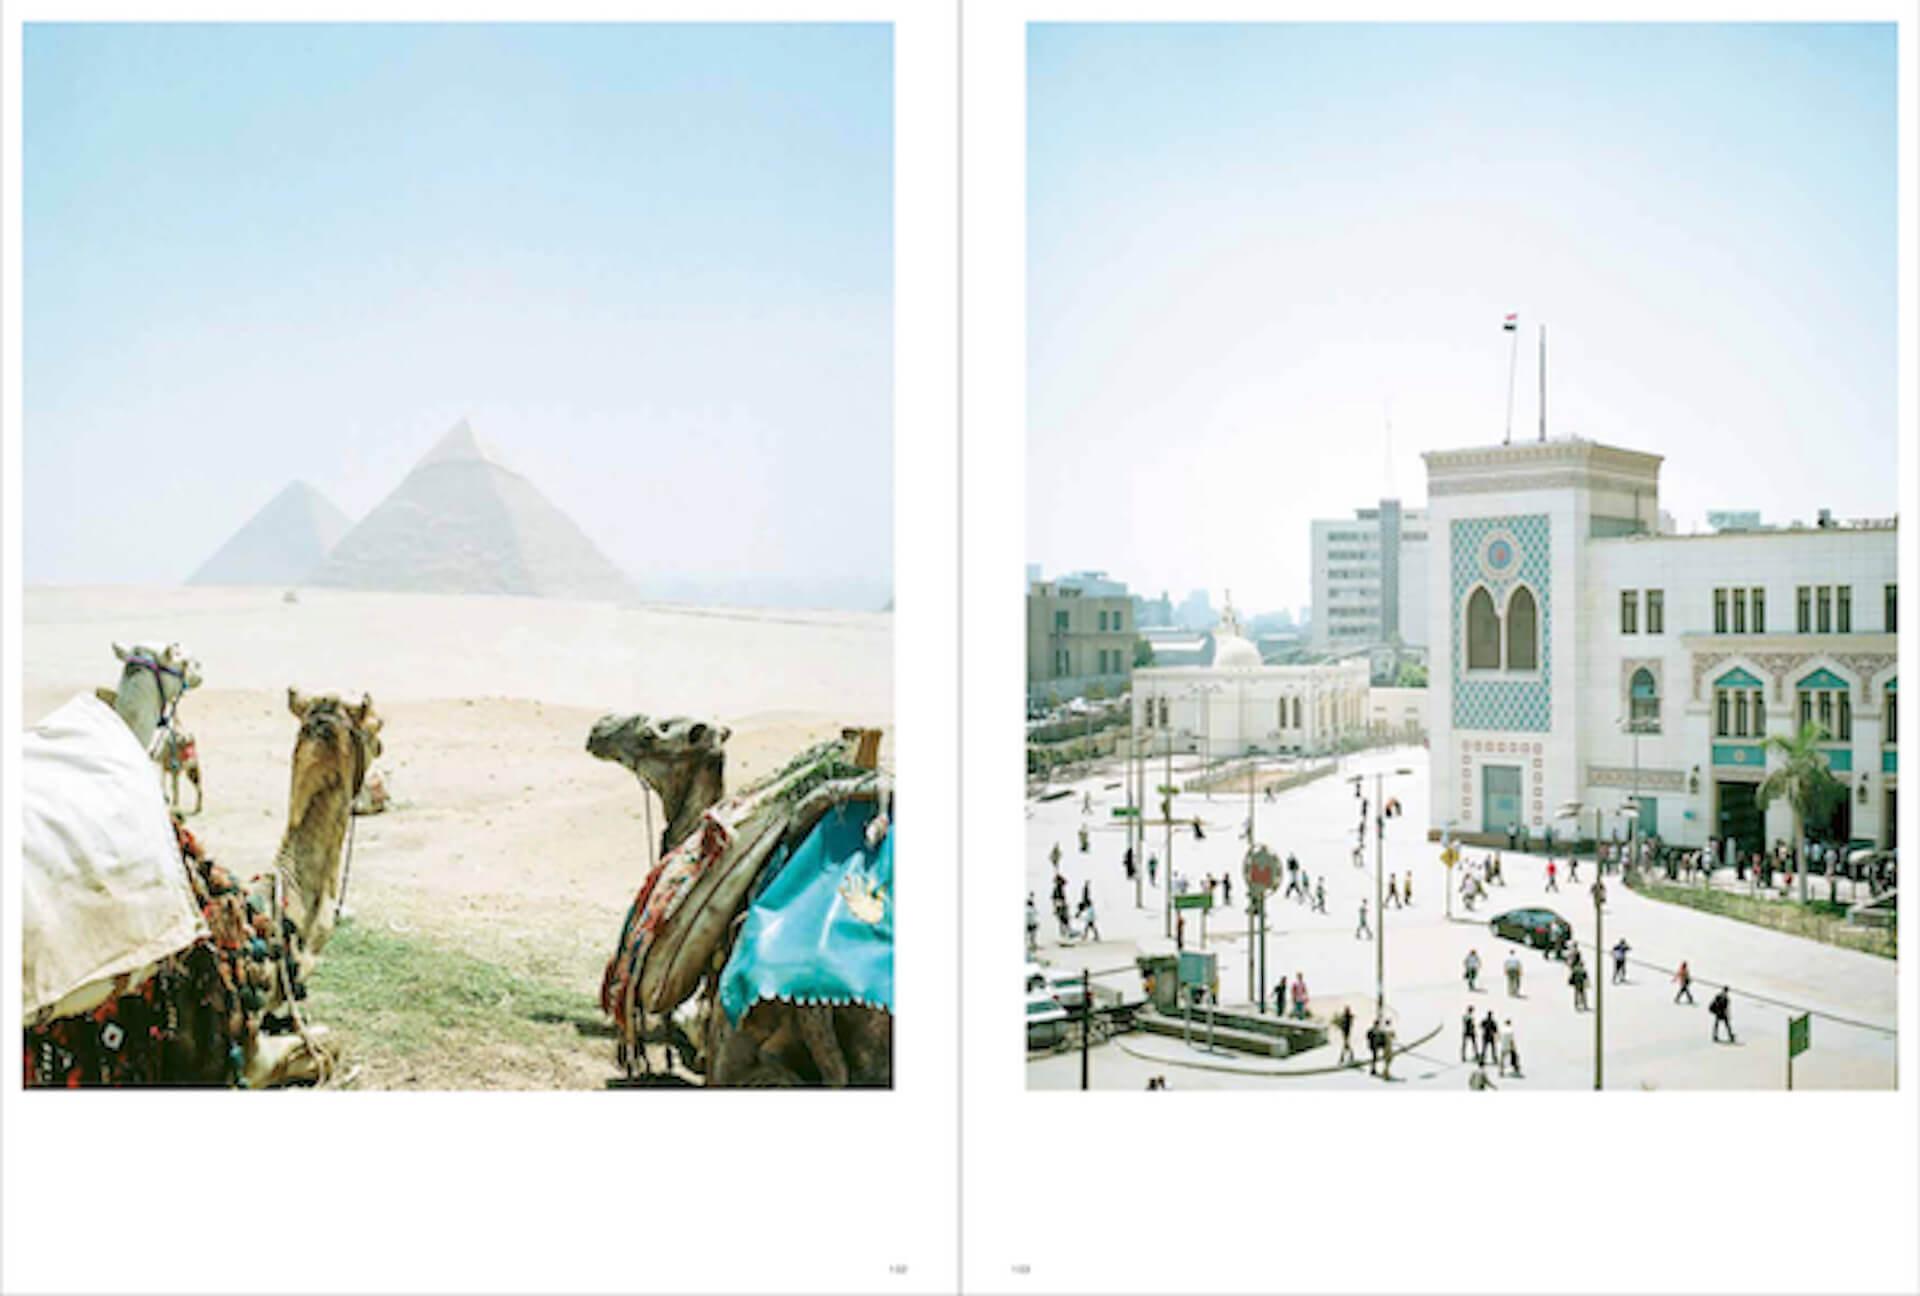 『TRANSIT』の10年超の歩みが2冊の写真集に!企画展<光の記憶- Through our habitat>も開催 art191029_transit_4